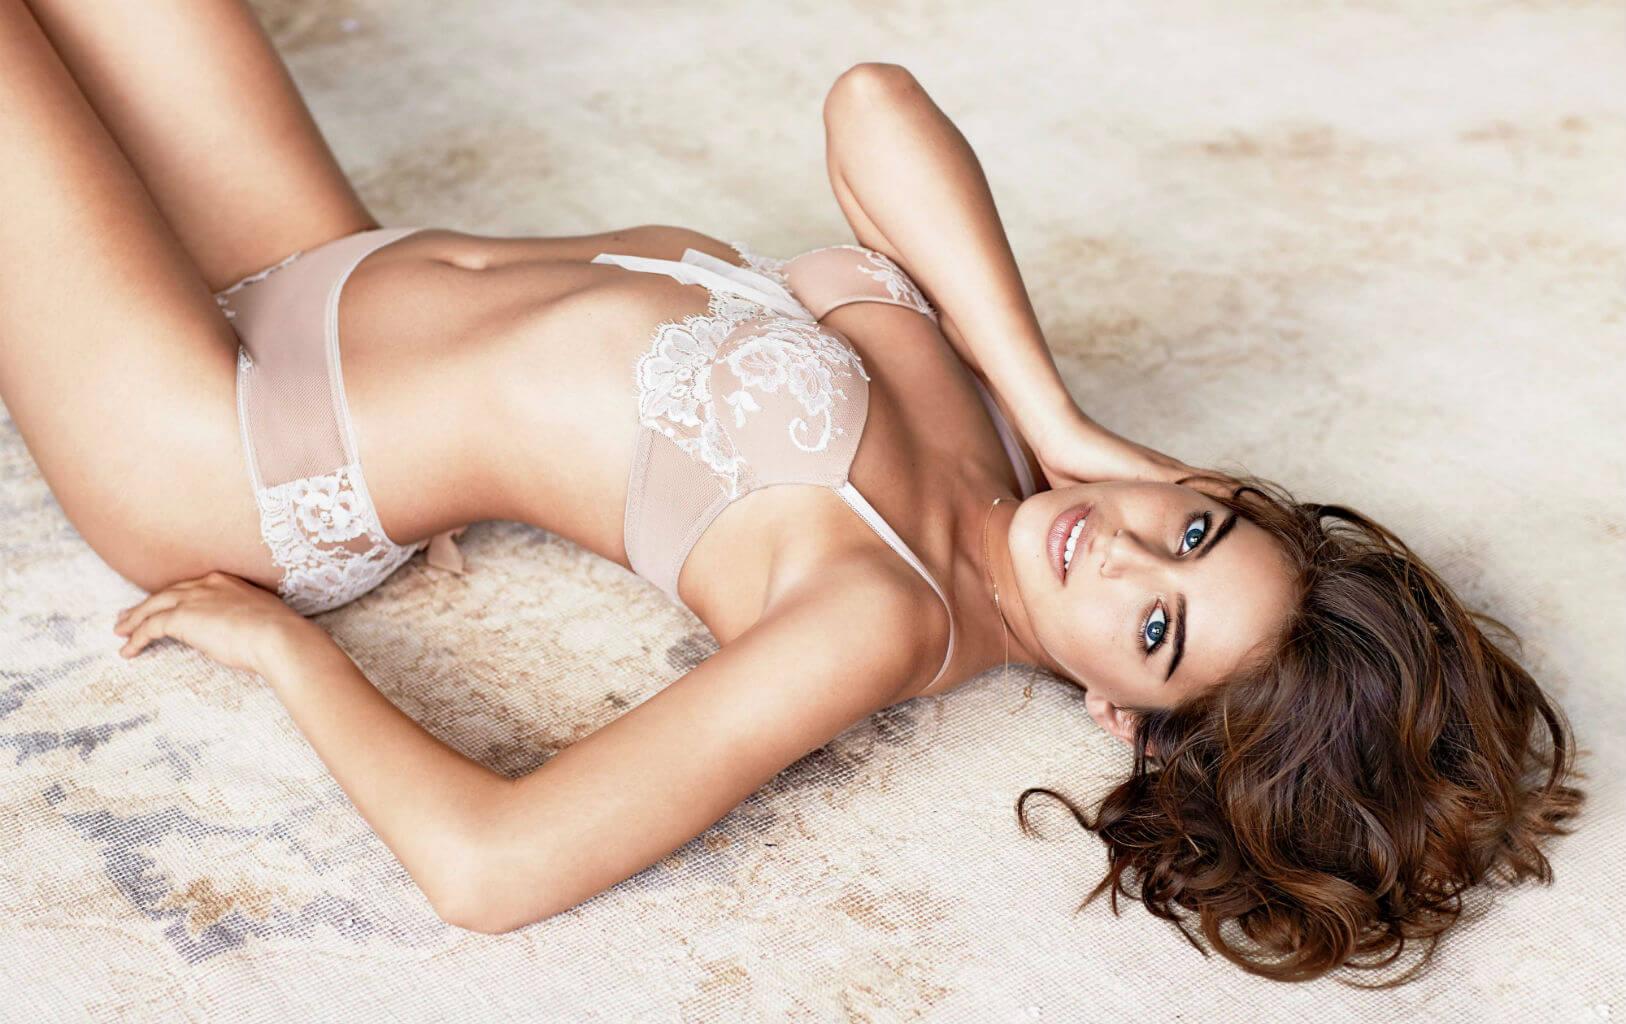 806836fdfb The Italian Victoria s Secret   Meet Intimissimi Lingerie